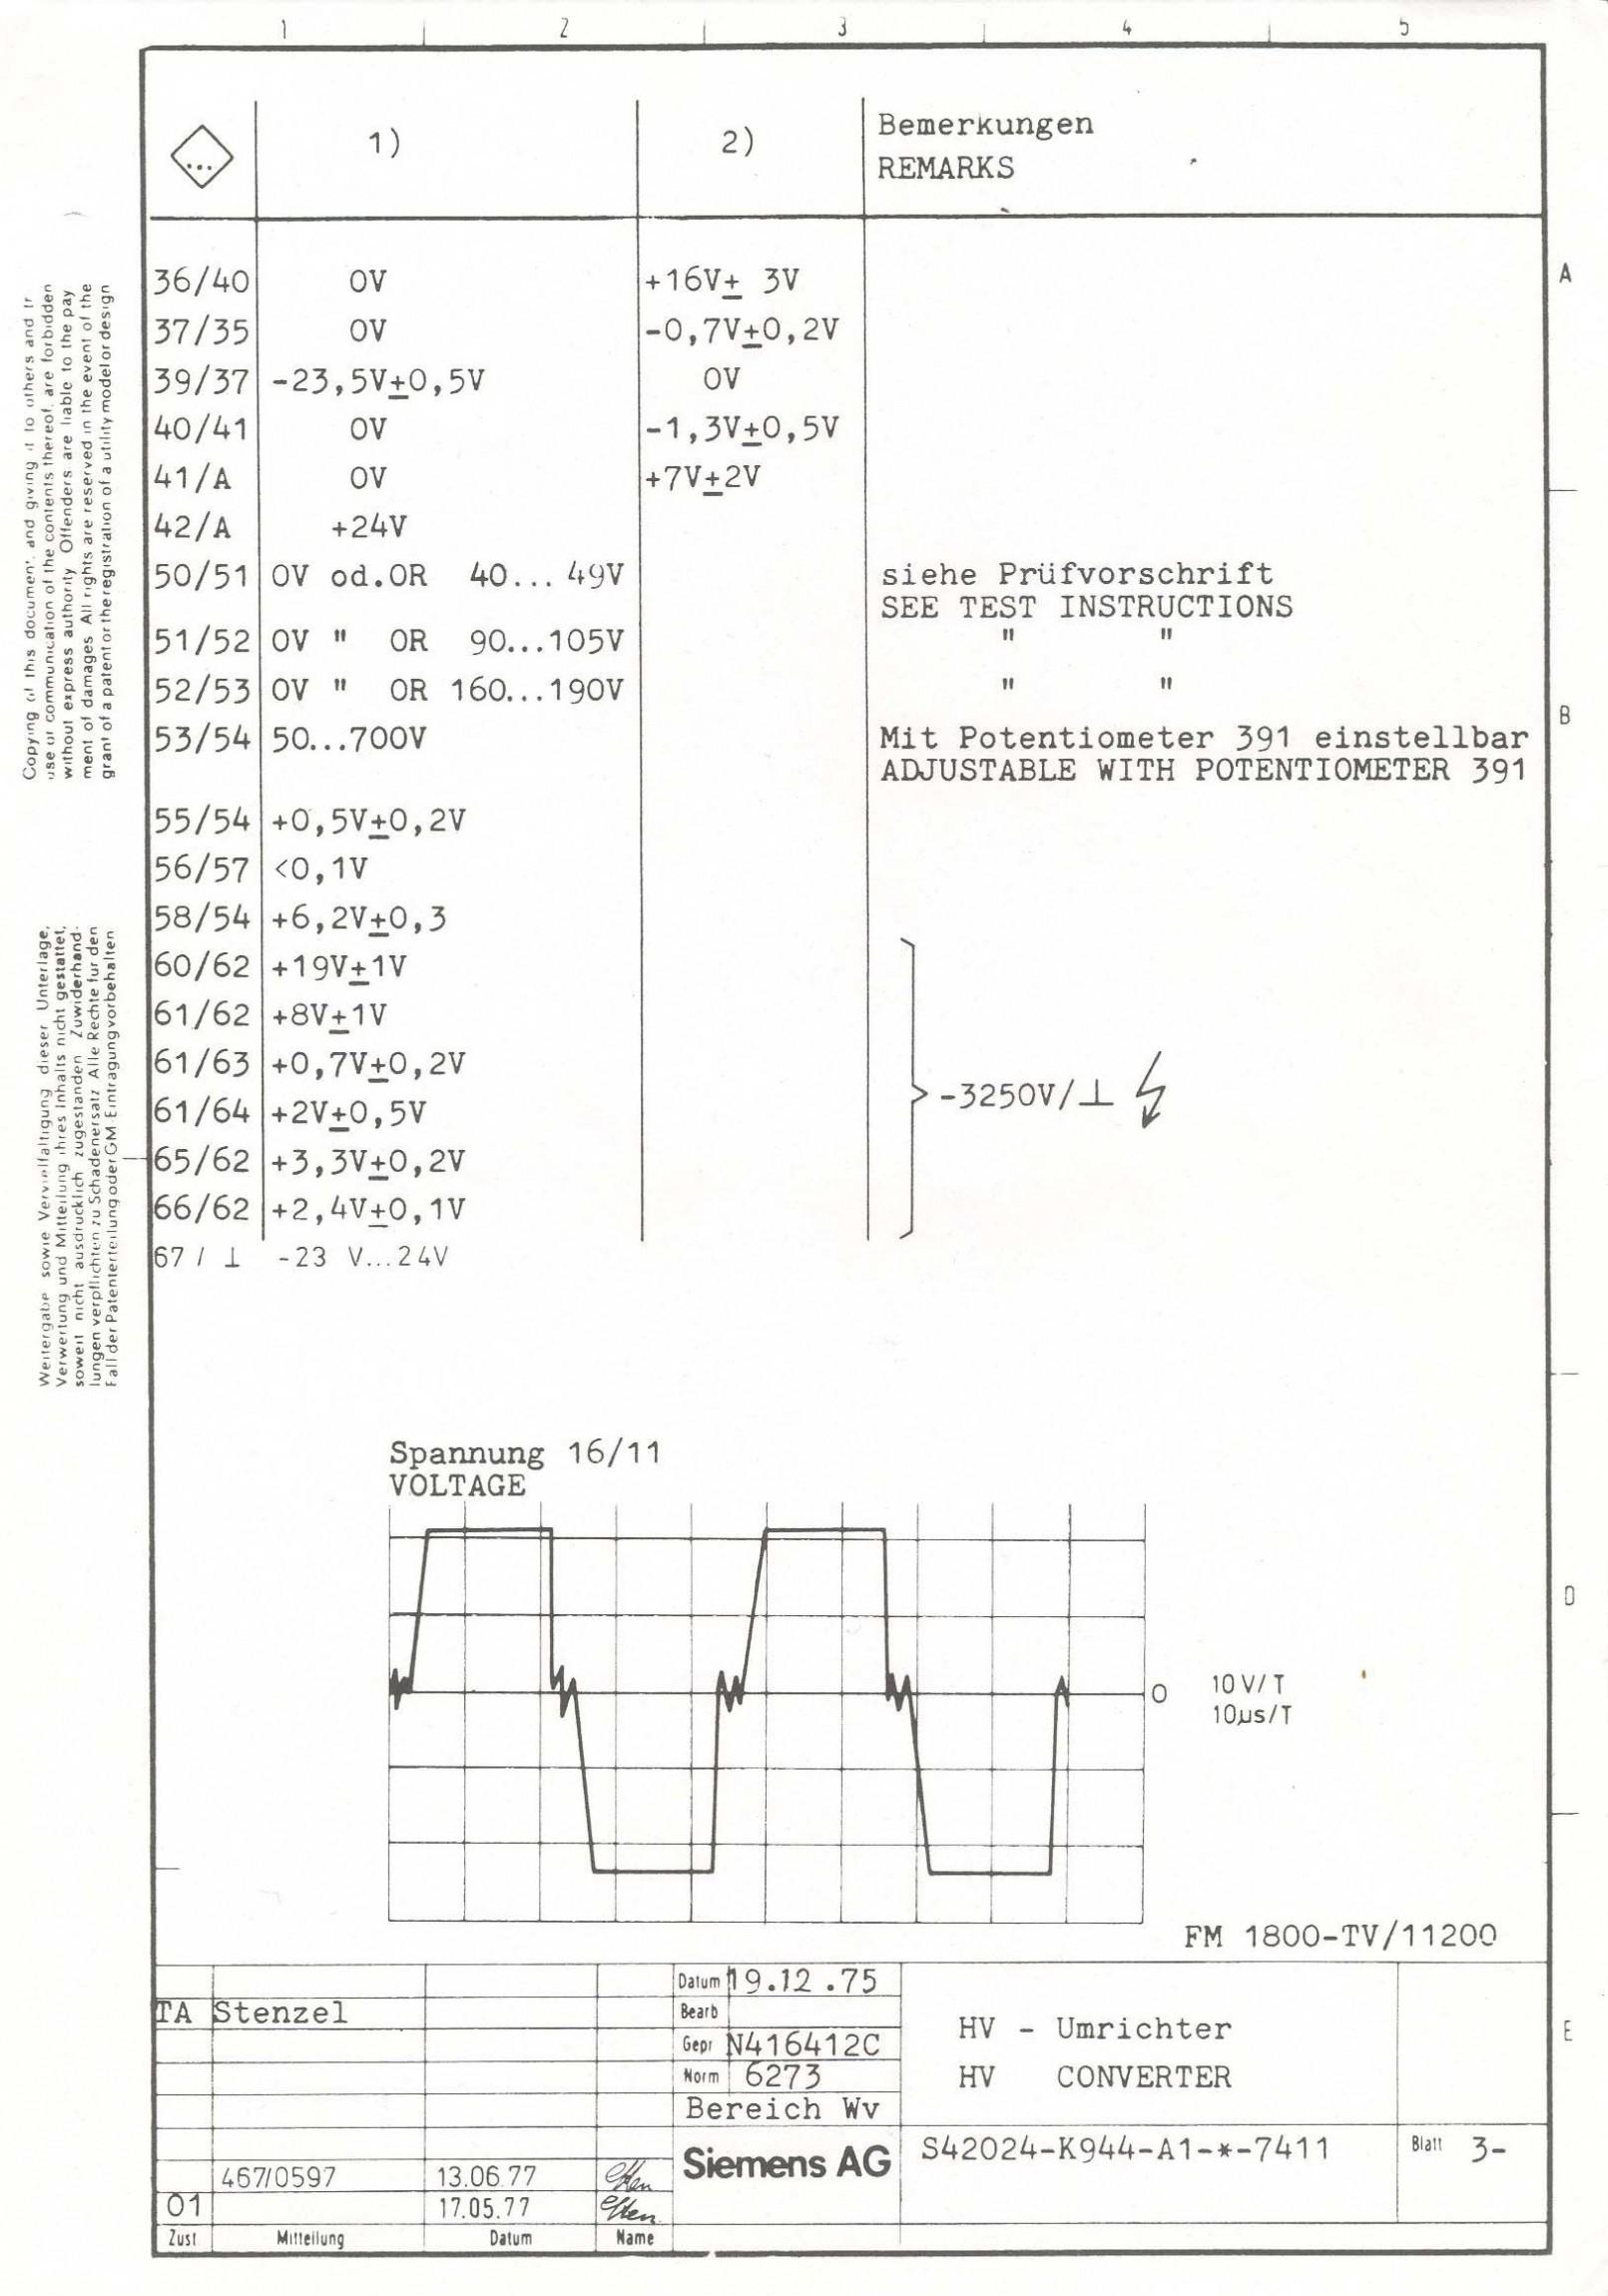 30 Amp Twist Lock Plug Wiring Diagram 50 Amp Twist Lock Plug Wiring Diagram Rate 4 Prong Generator Plug Of 30 Amp Twist Lock Plug Wiring Diagram